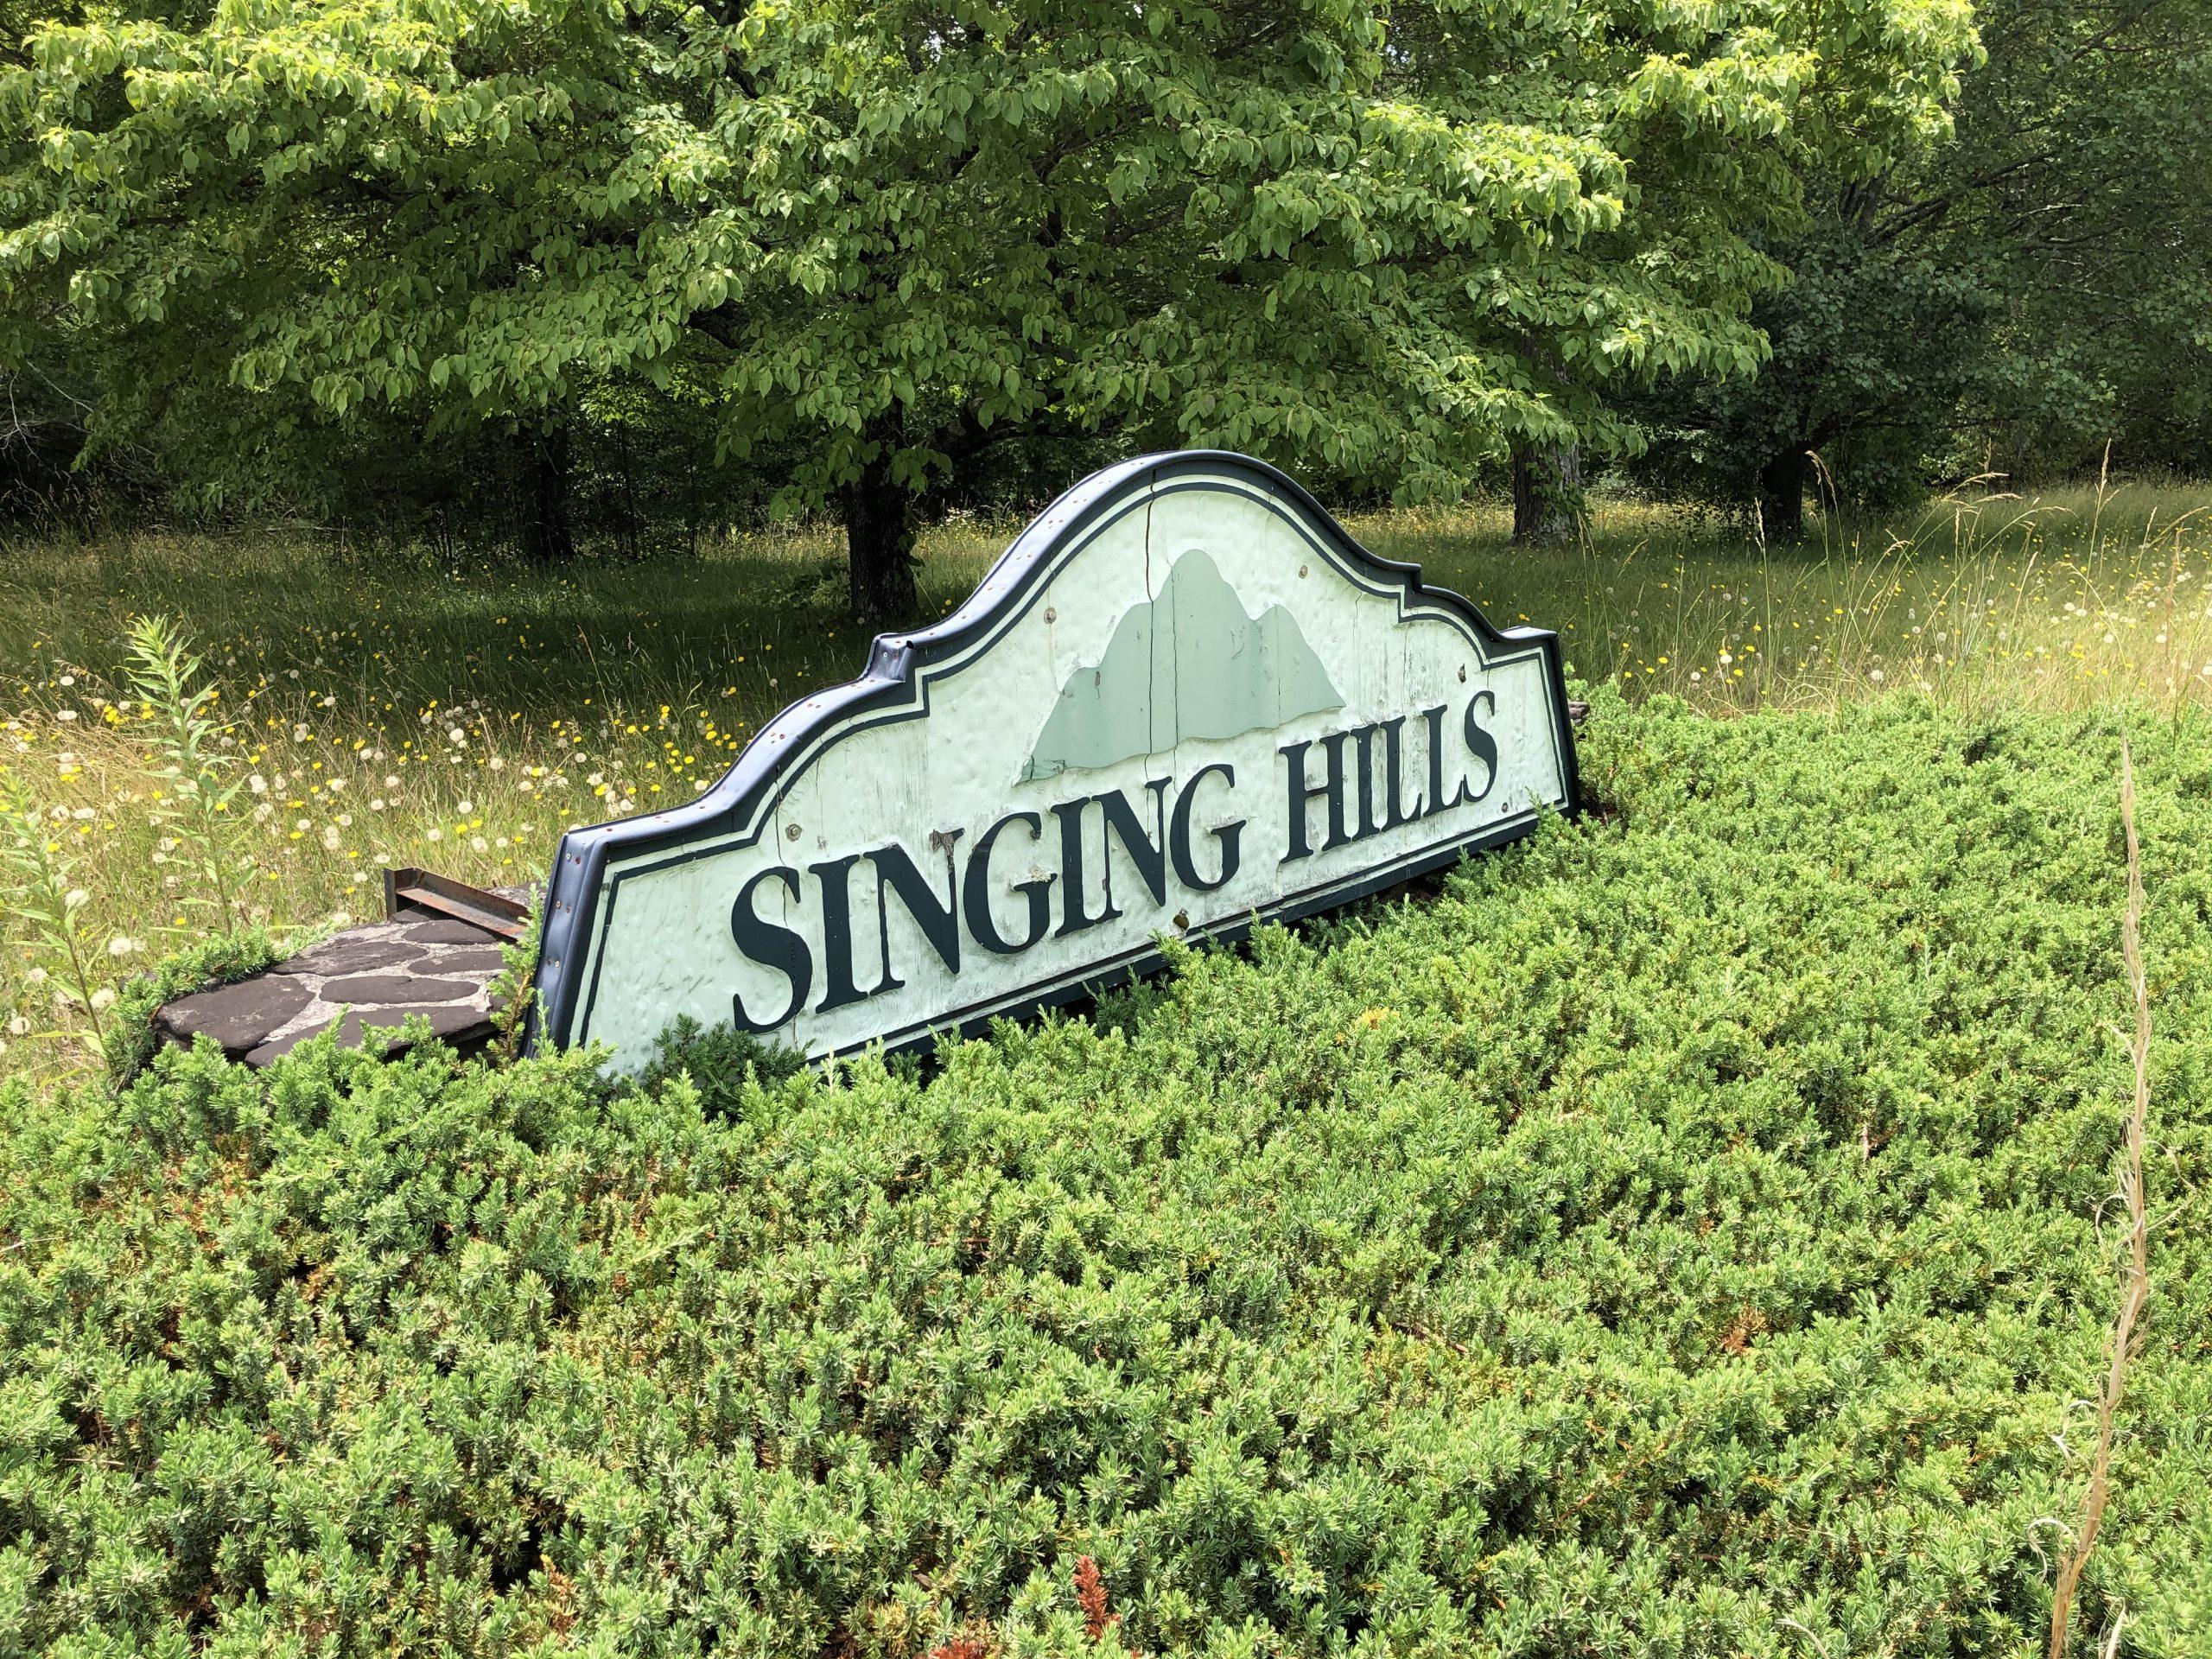 Singing Hills